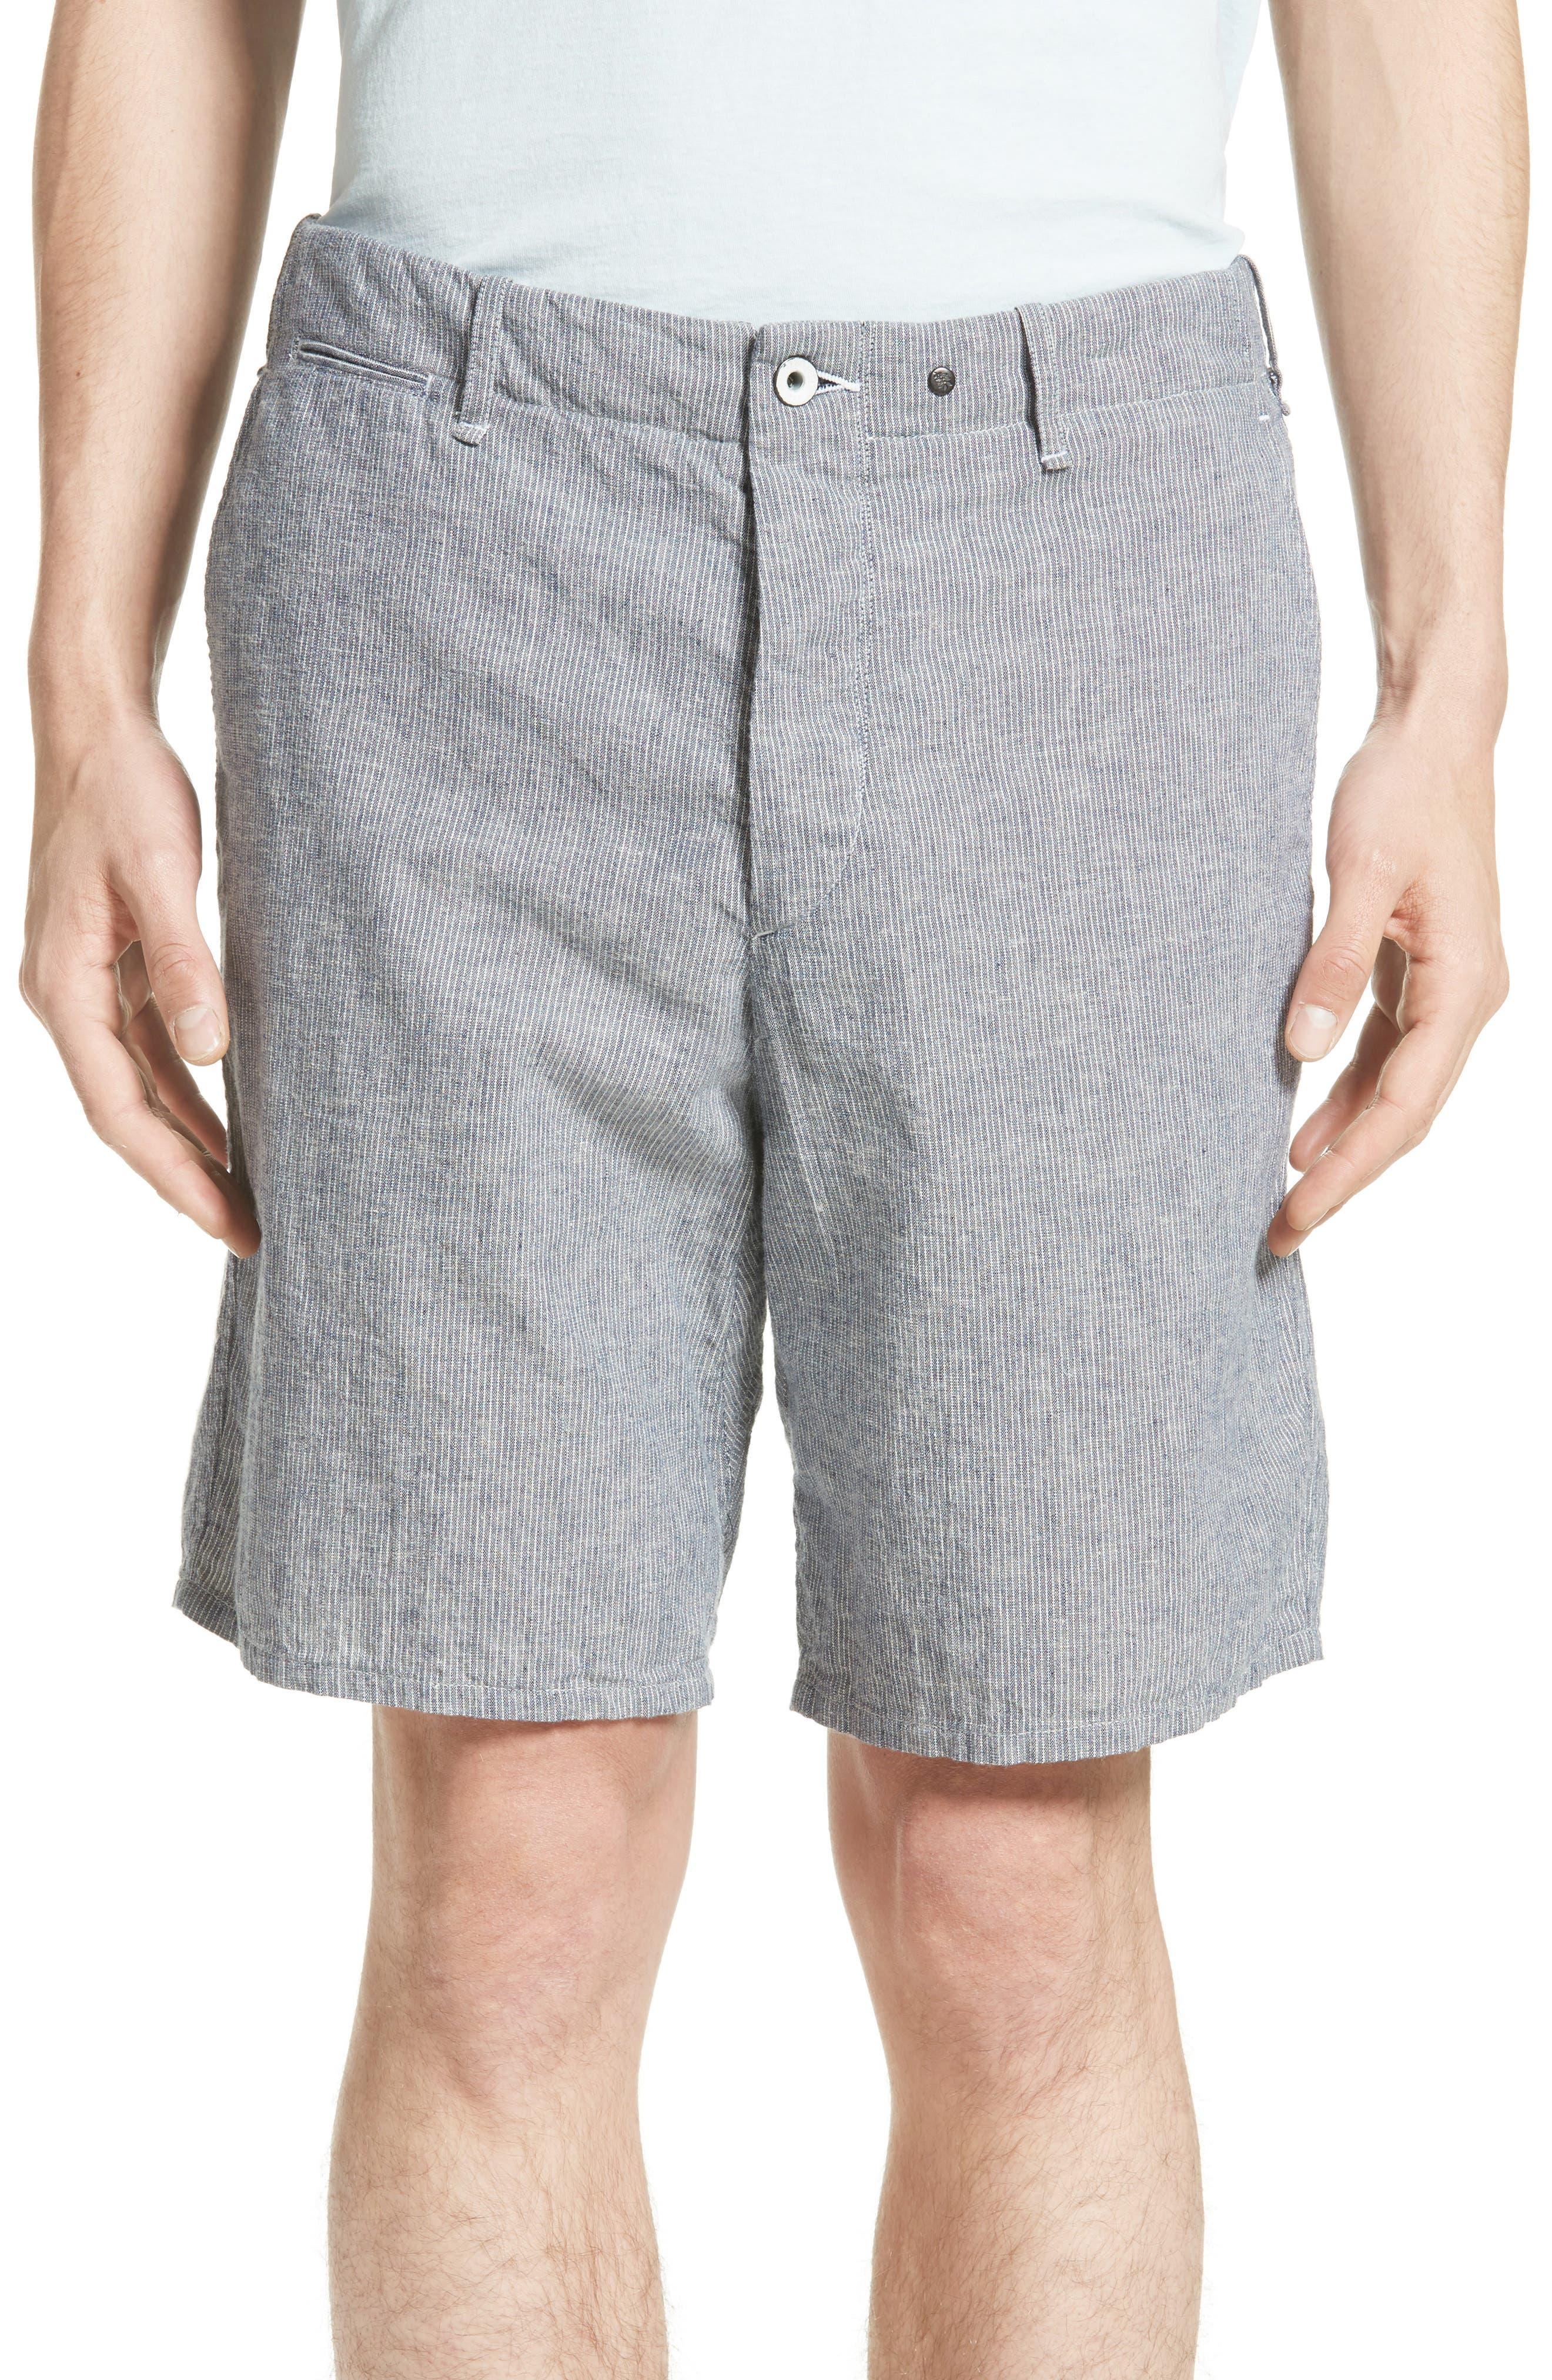 Beach II Shorts,                             Main thumbnail 1, color,                             410